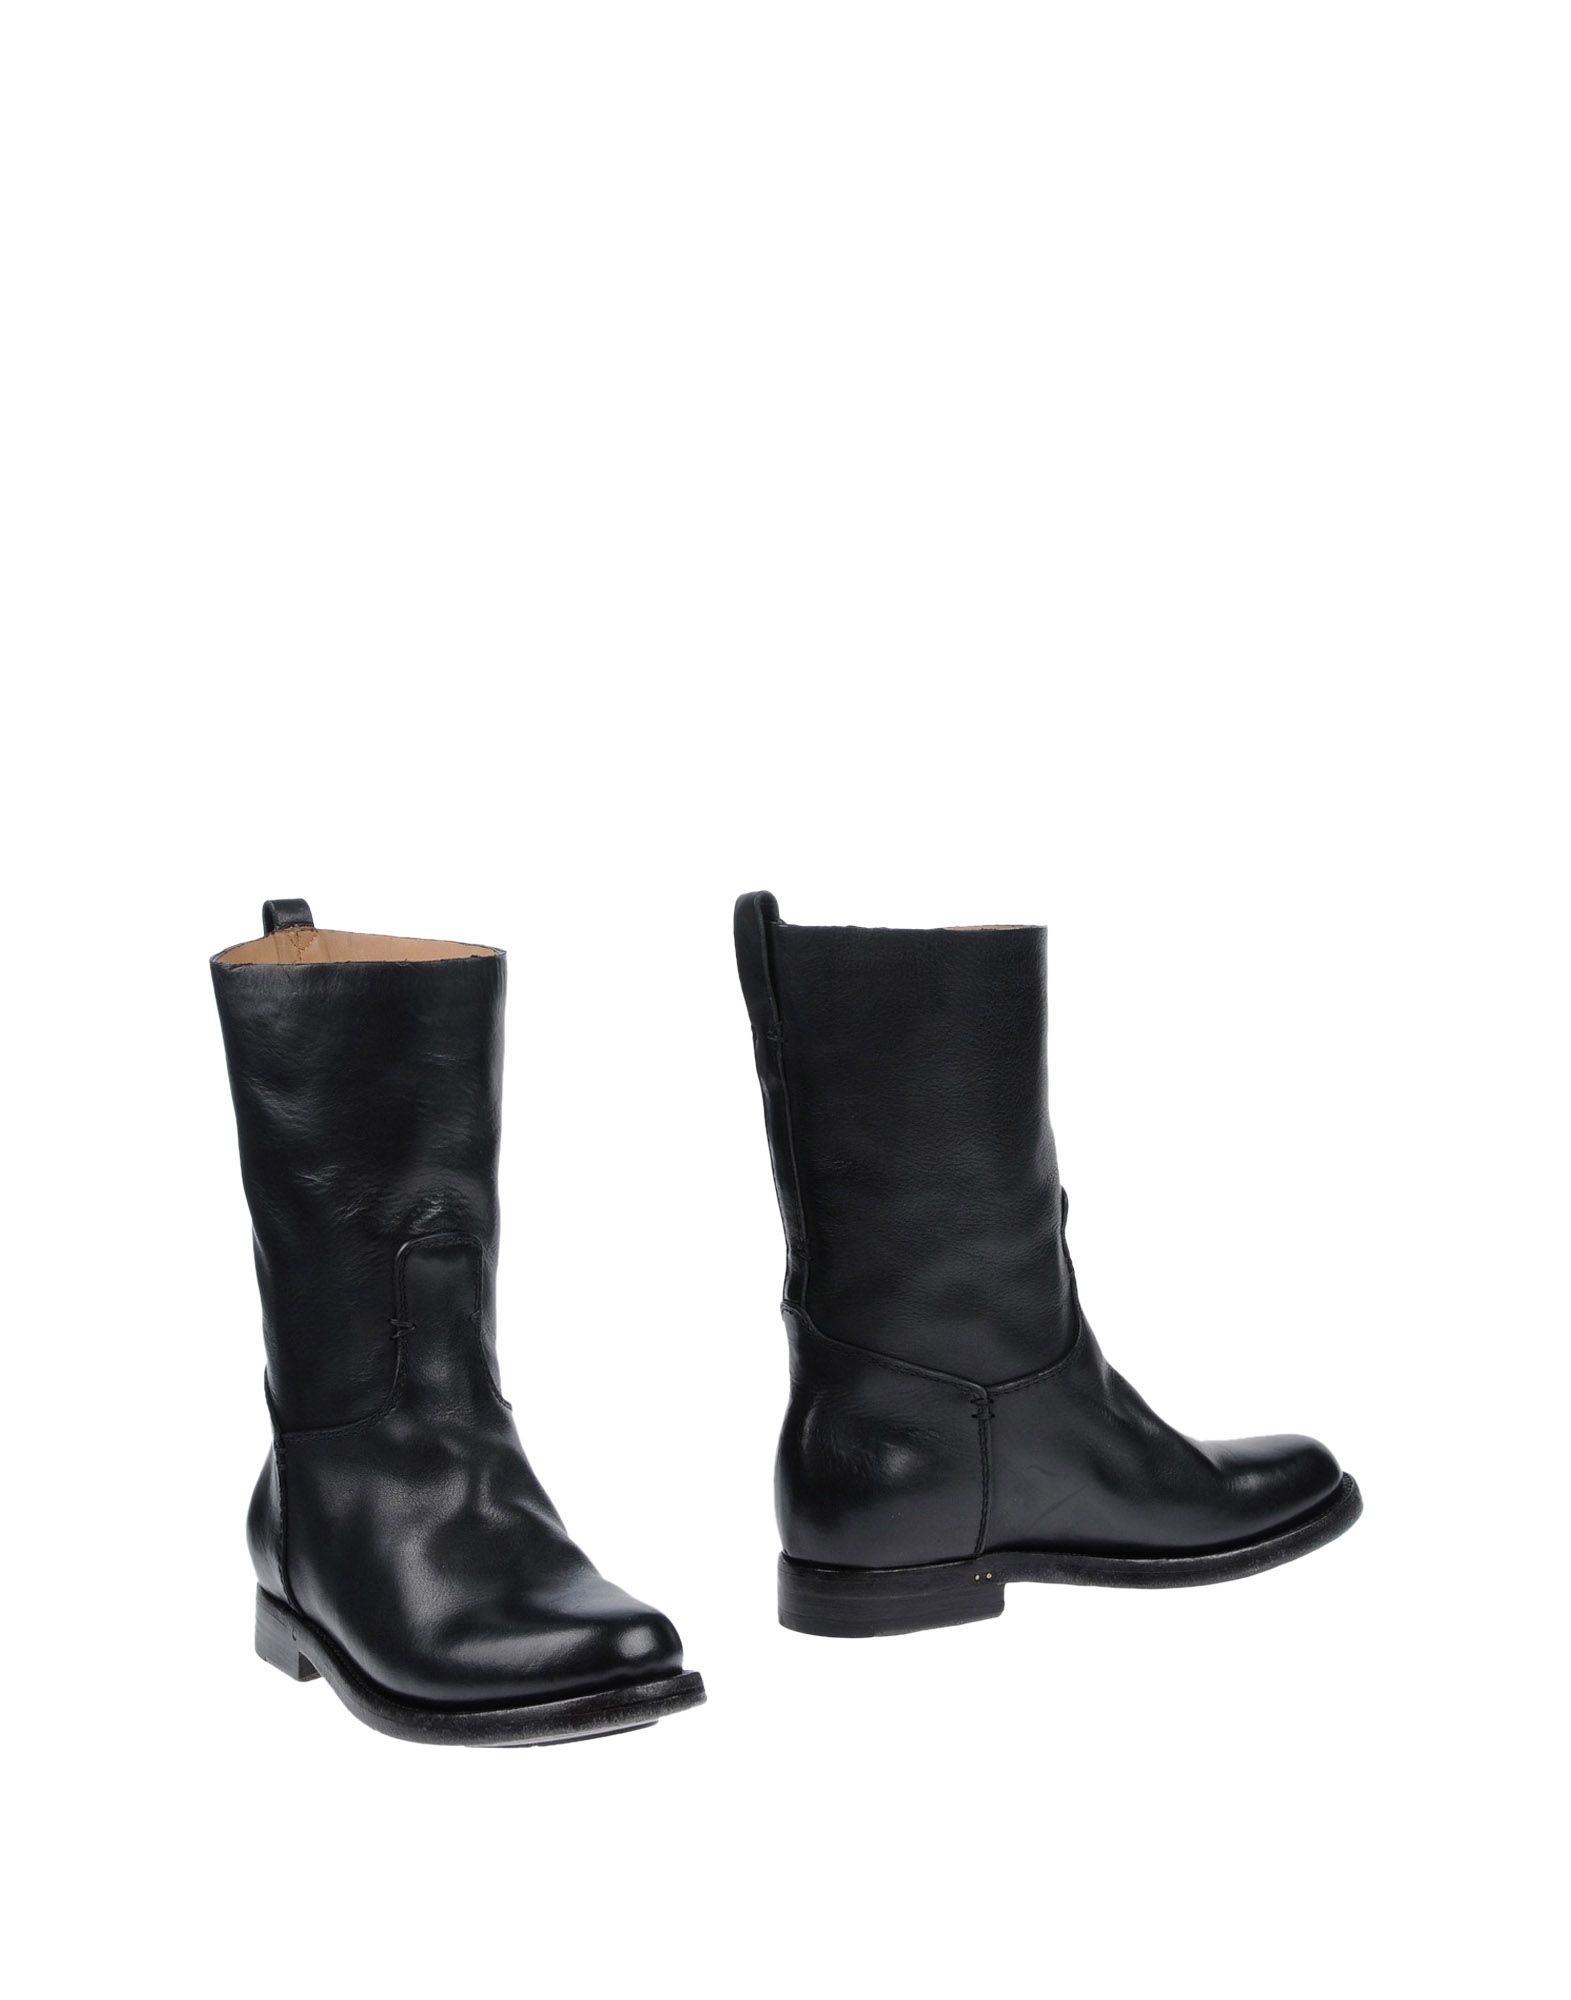 Silvano Sassetti 11457217RG Stiefel Damen  11457217RG Sassetti Beliebte Schuhe d6829a